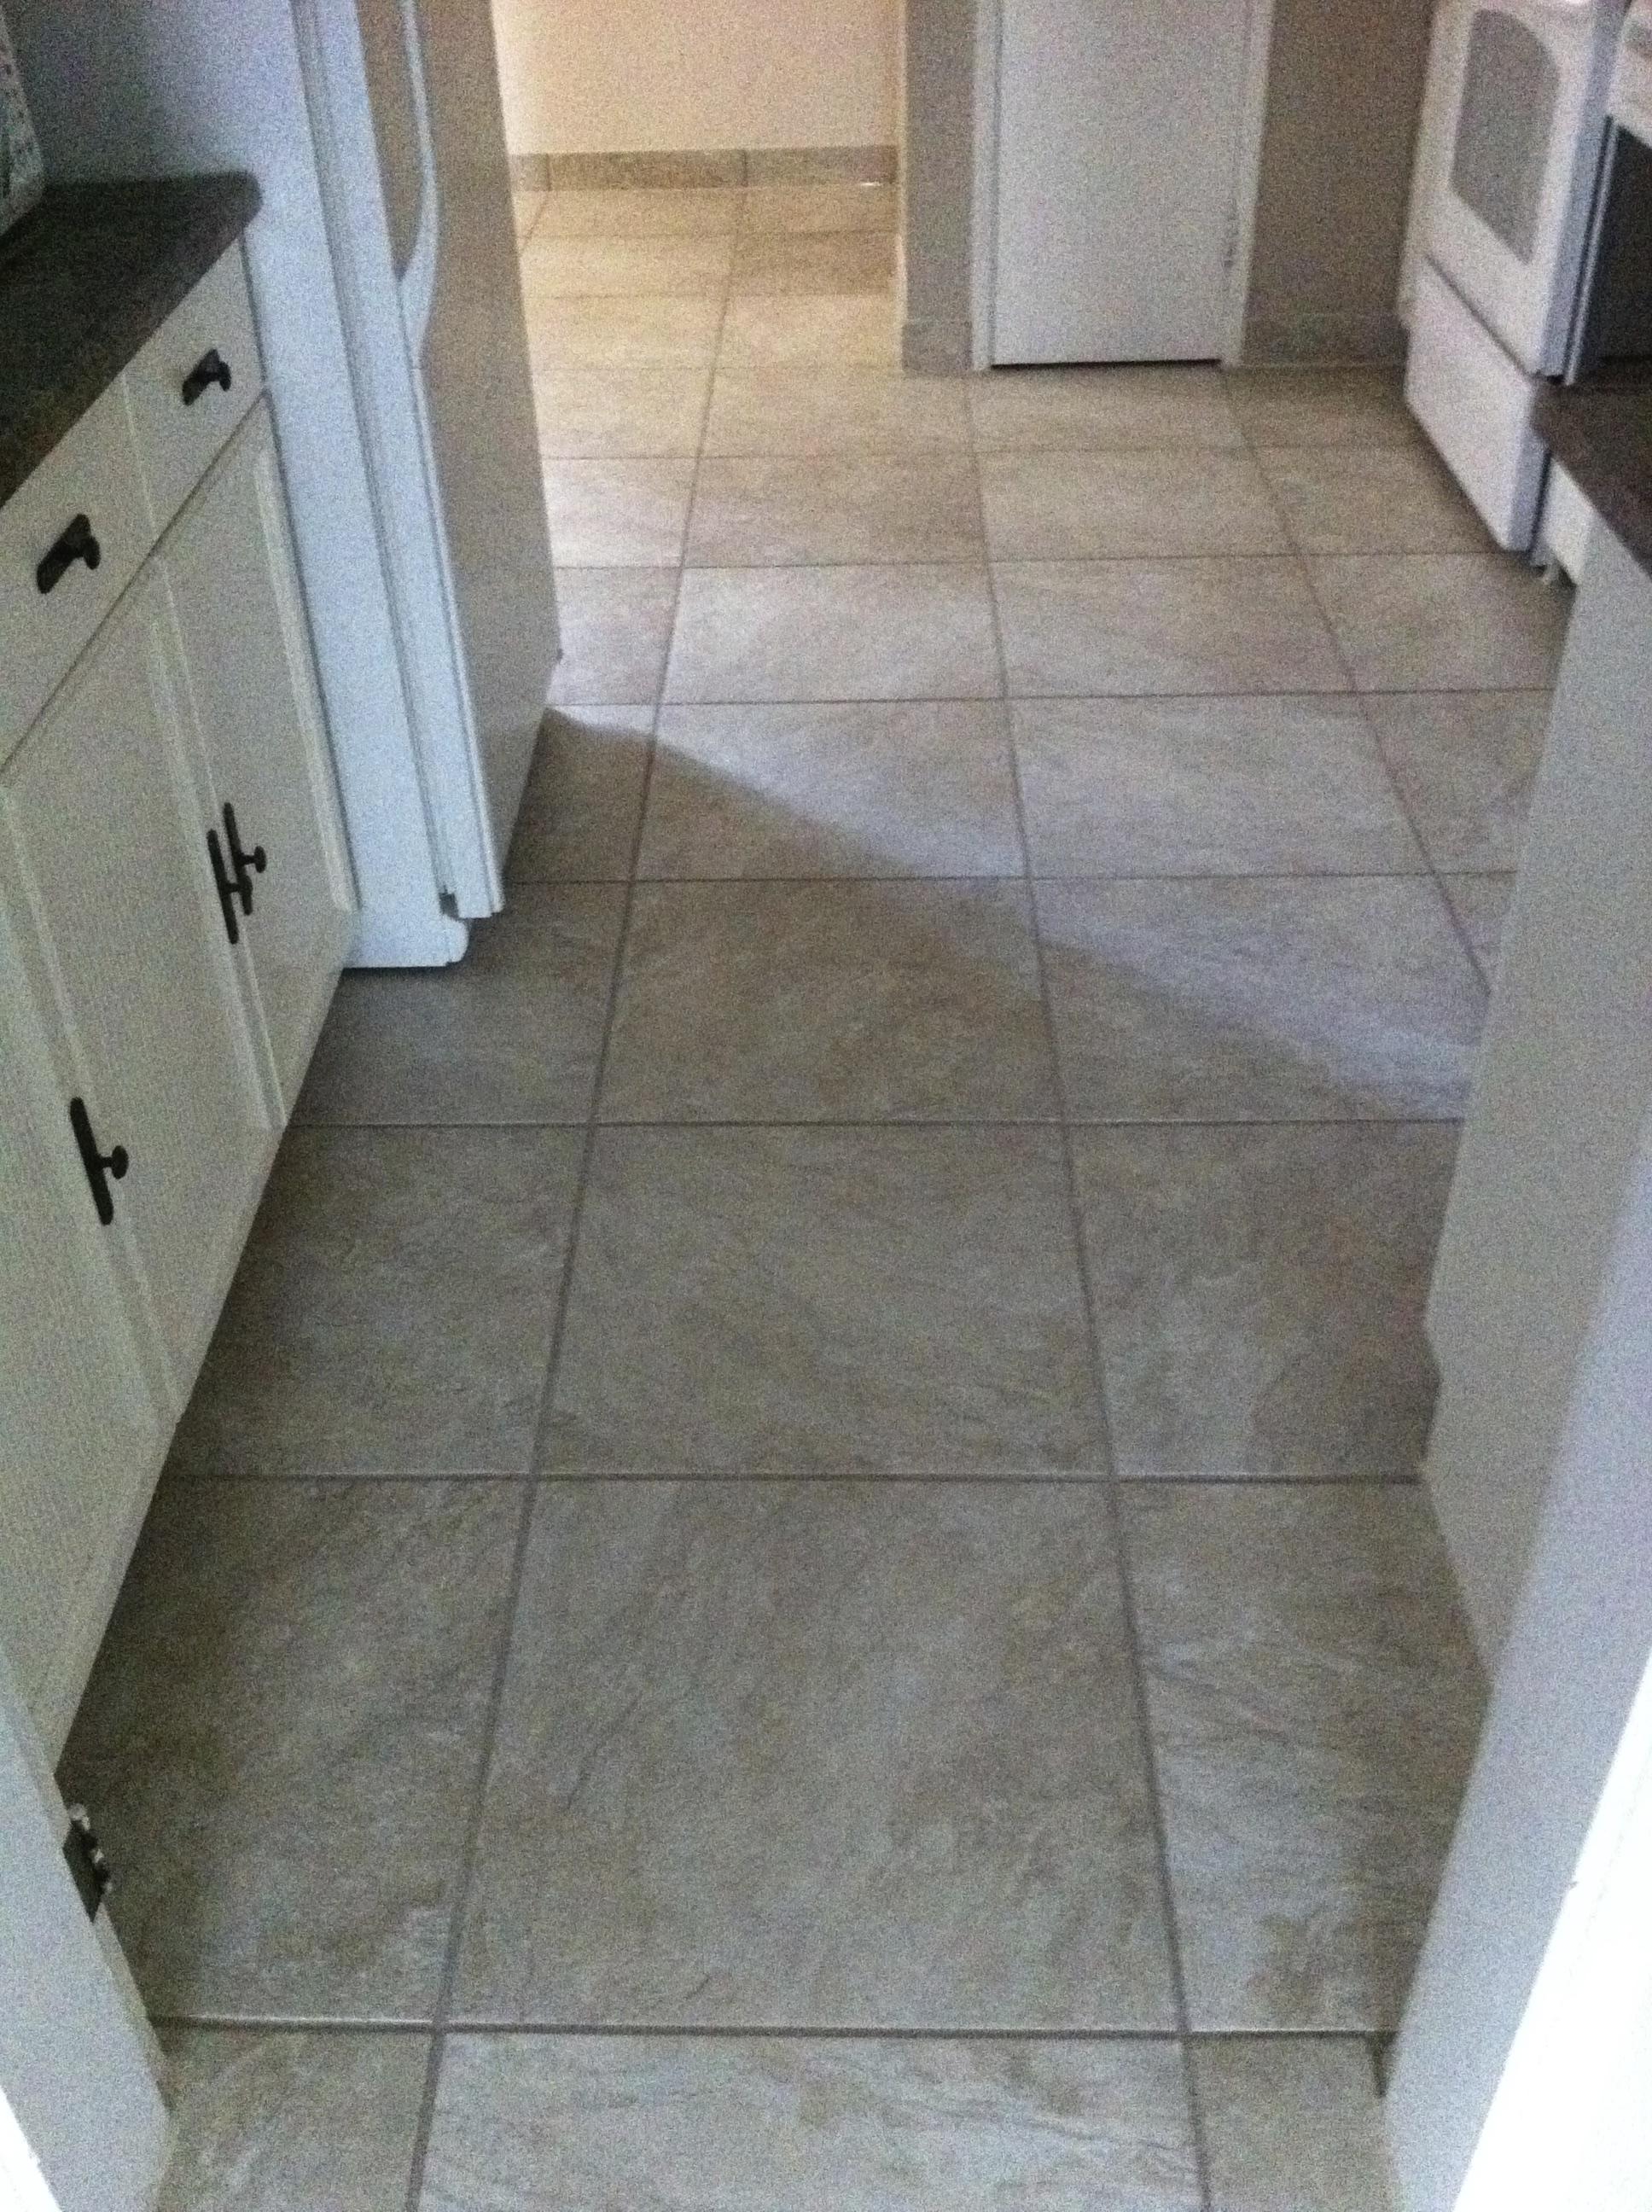 Ceramic tile works omaha images tile flooring design ideas ceramic tile work images tile flooring design ideas 20x20 ceramic tile choice image tile flooring design dailygadgetfo Gallery